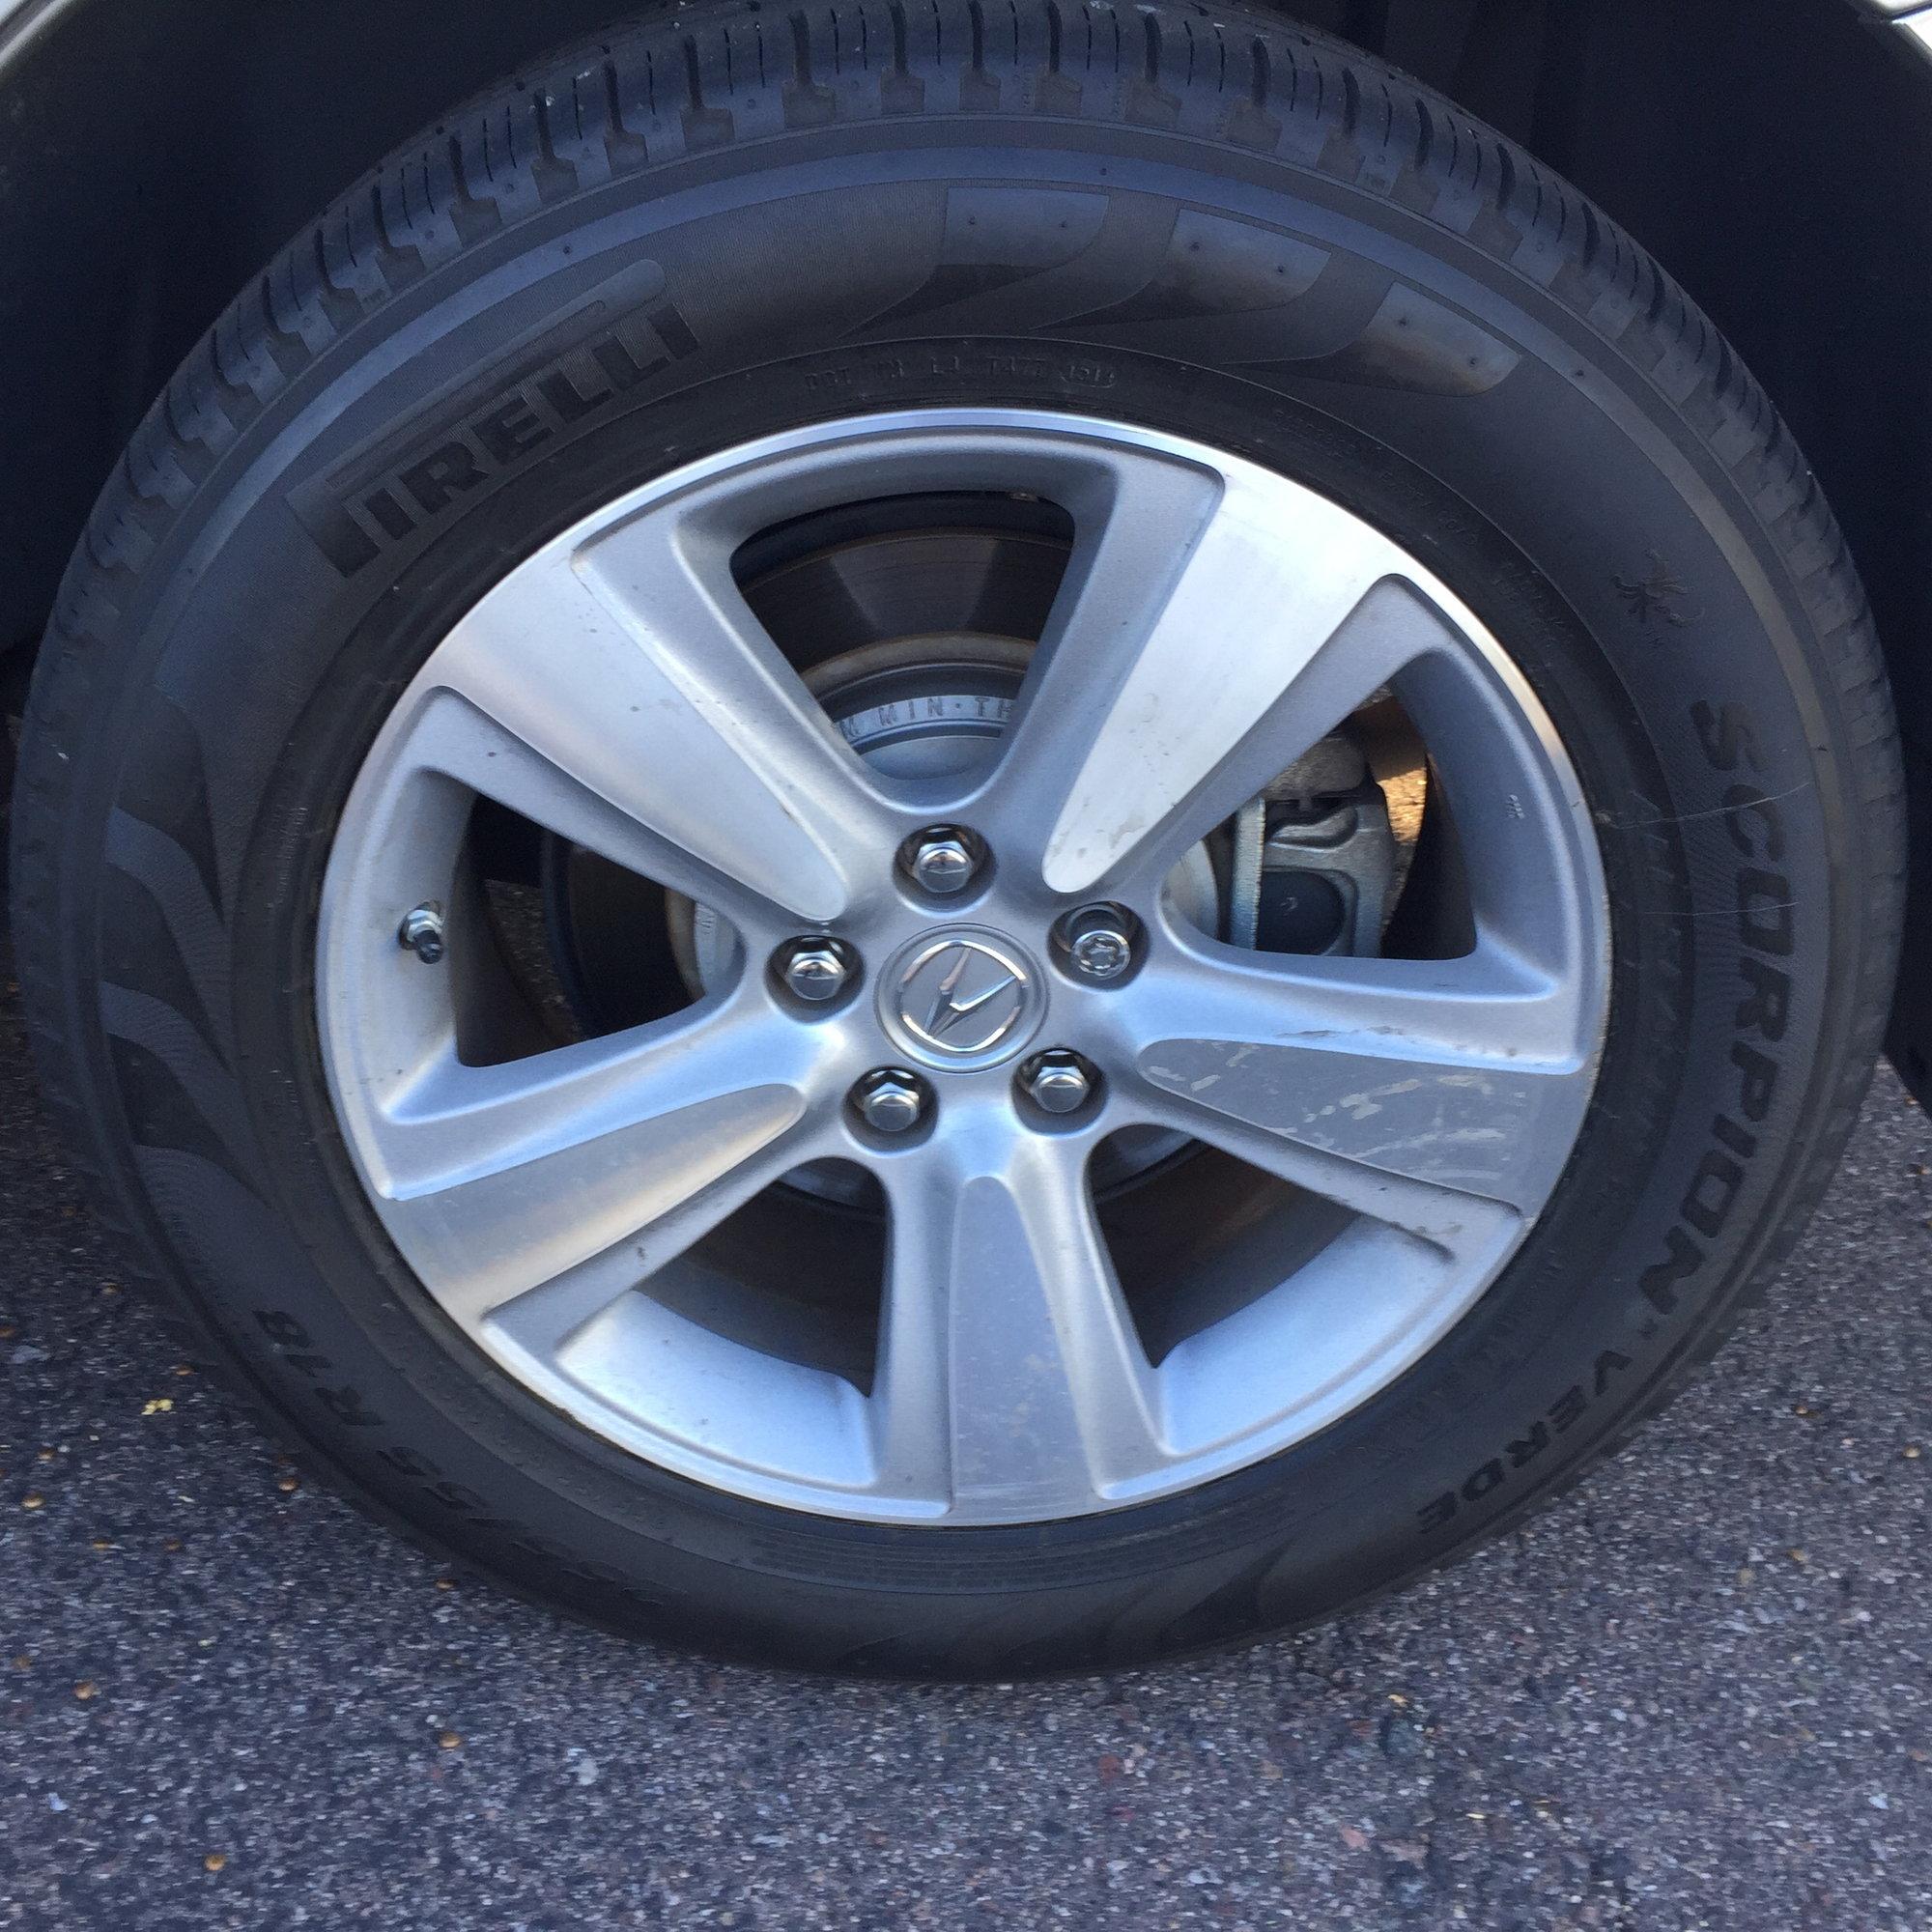 2010 AWD Tire Experiences